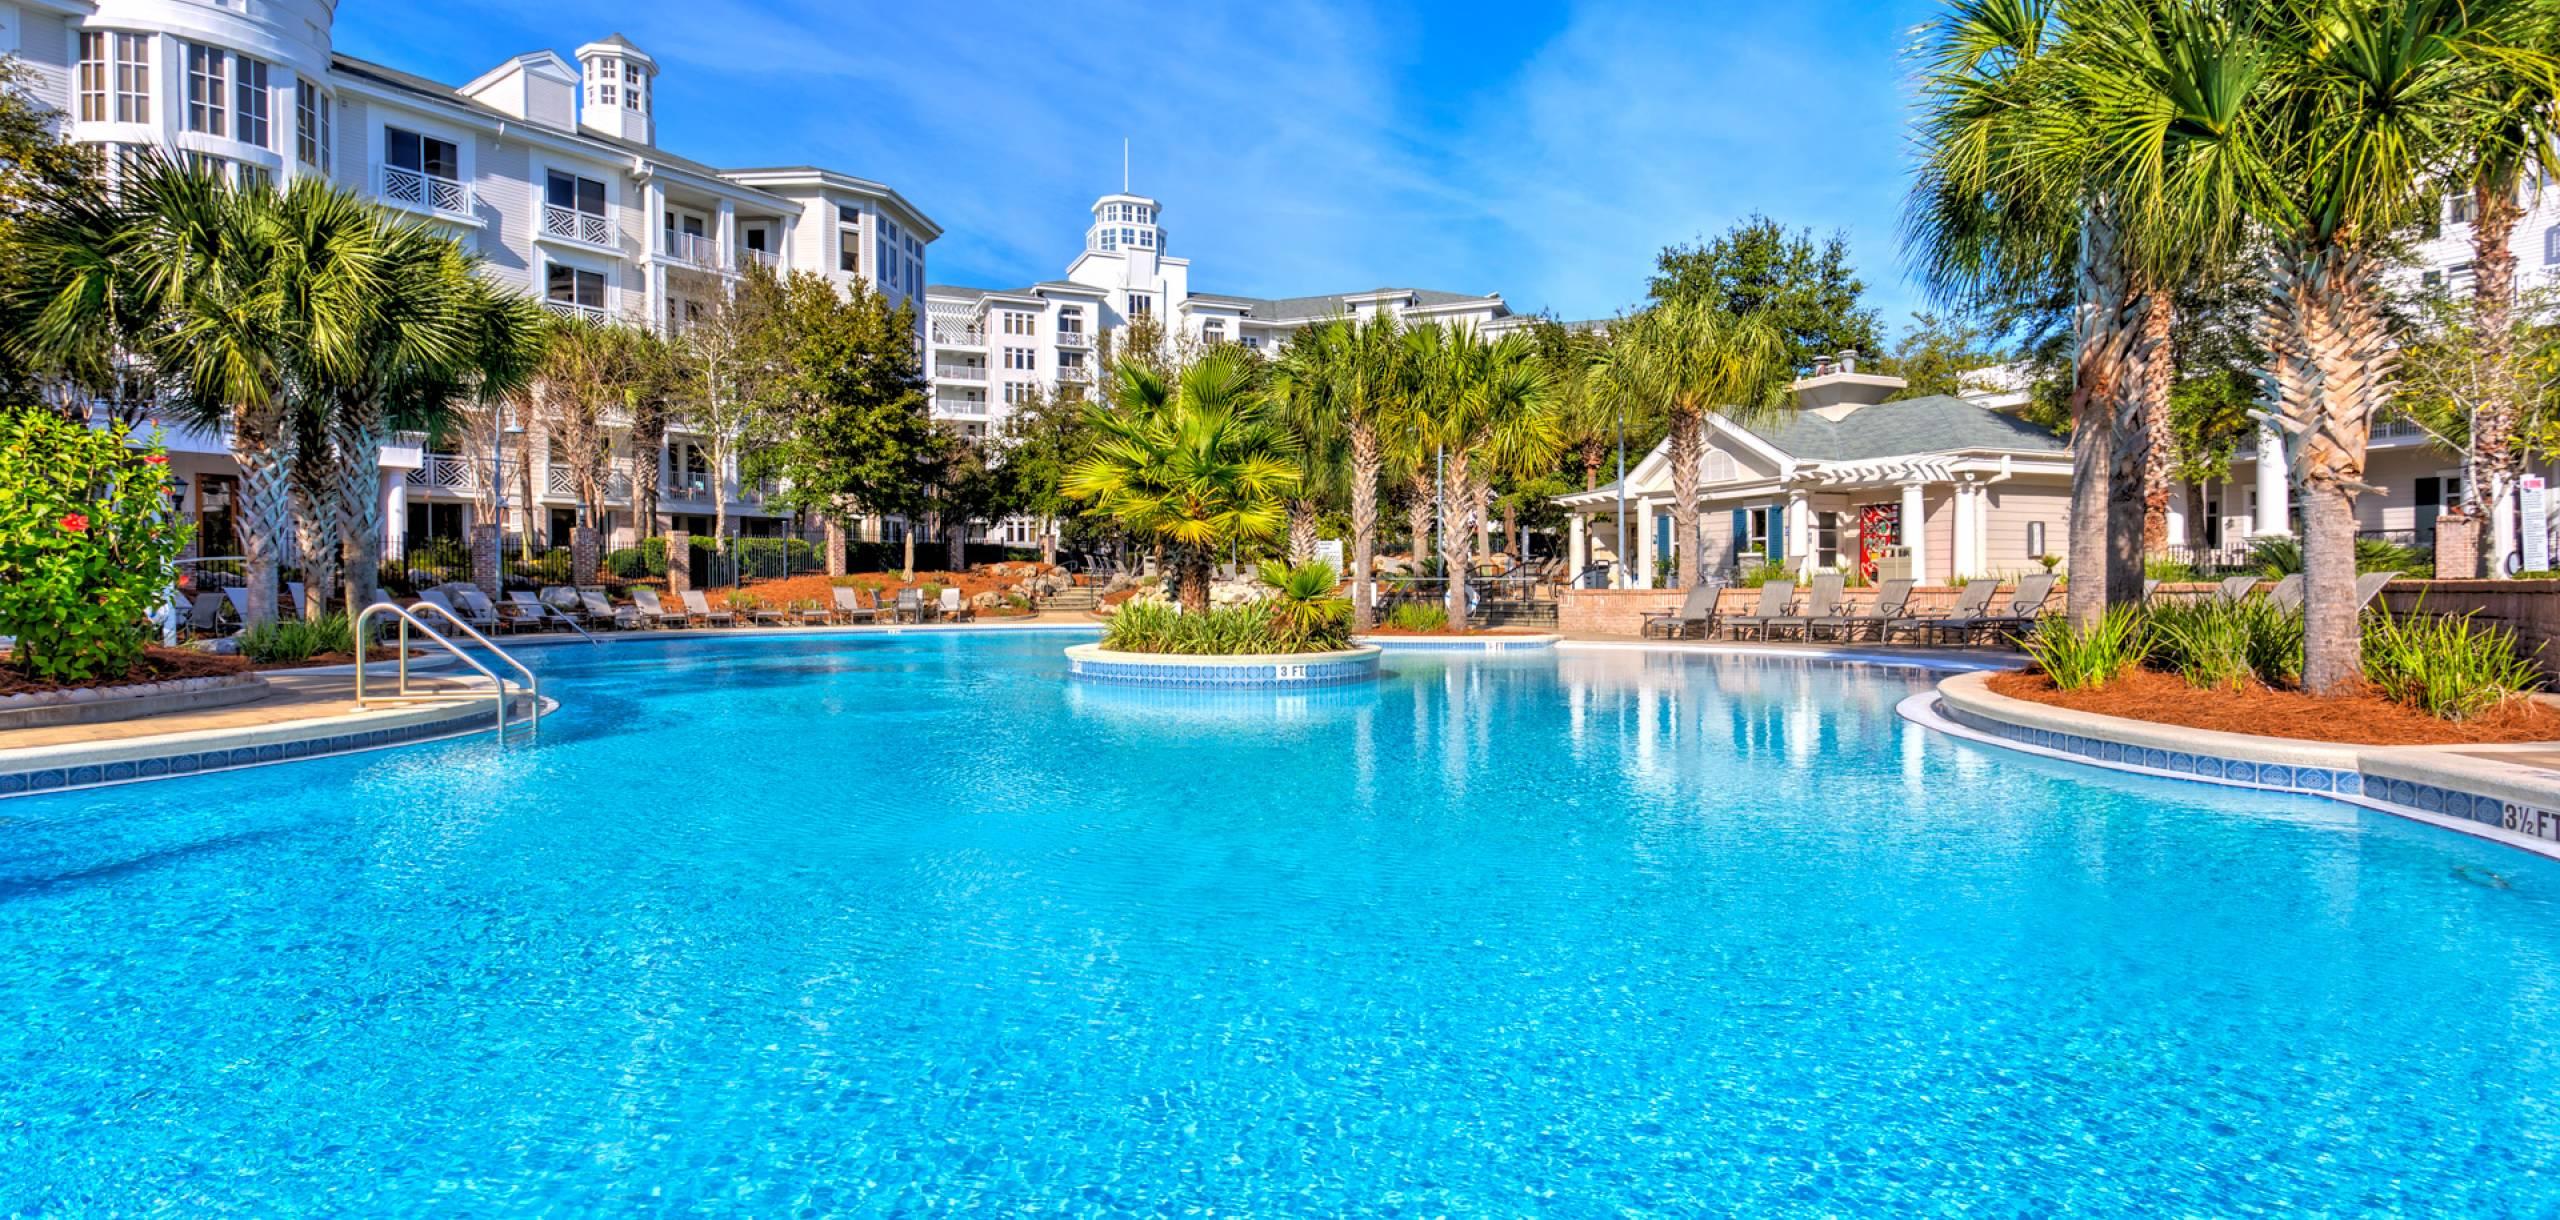 Destin resort pool